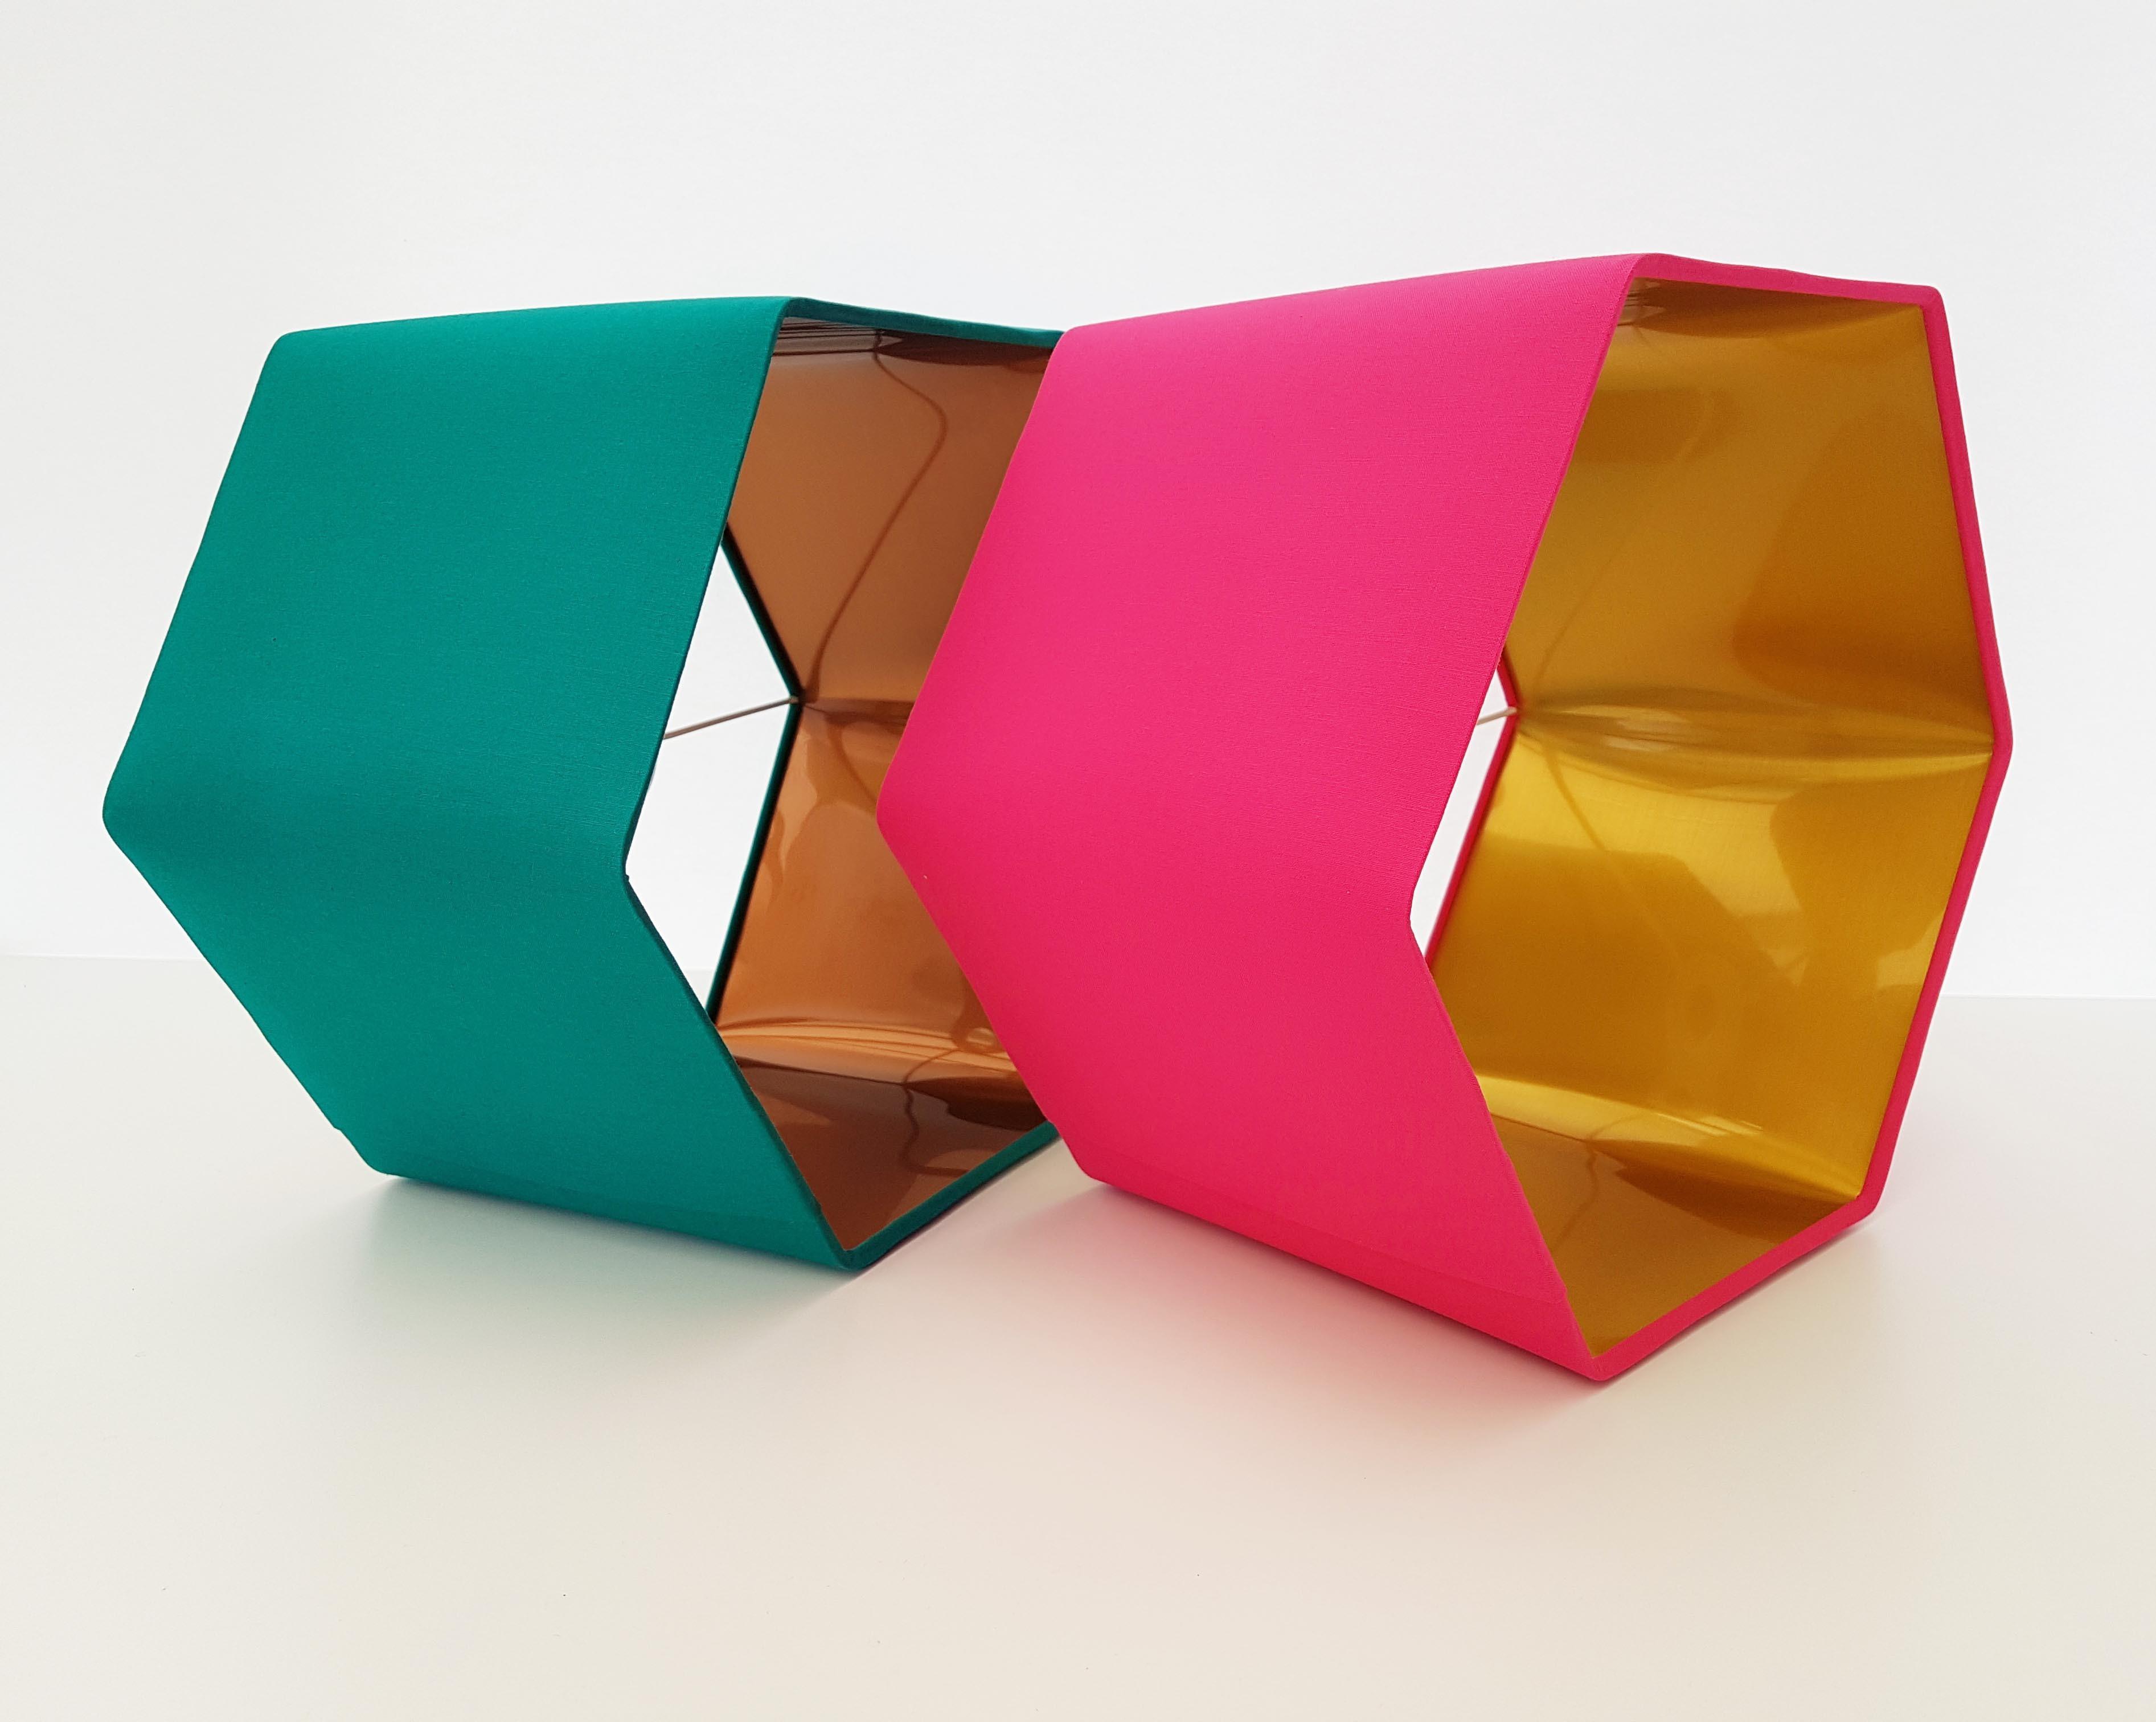 Hexagonal Shades